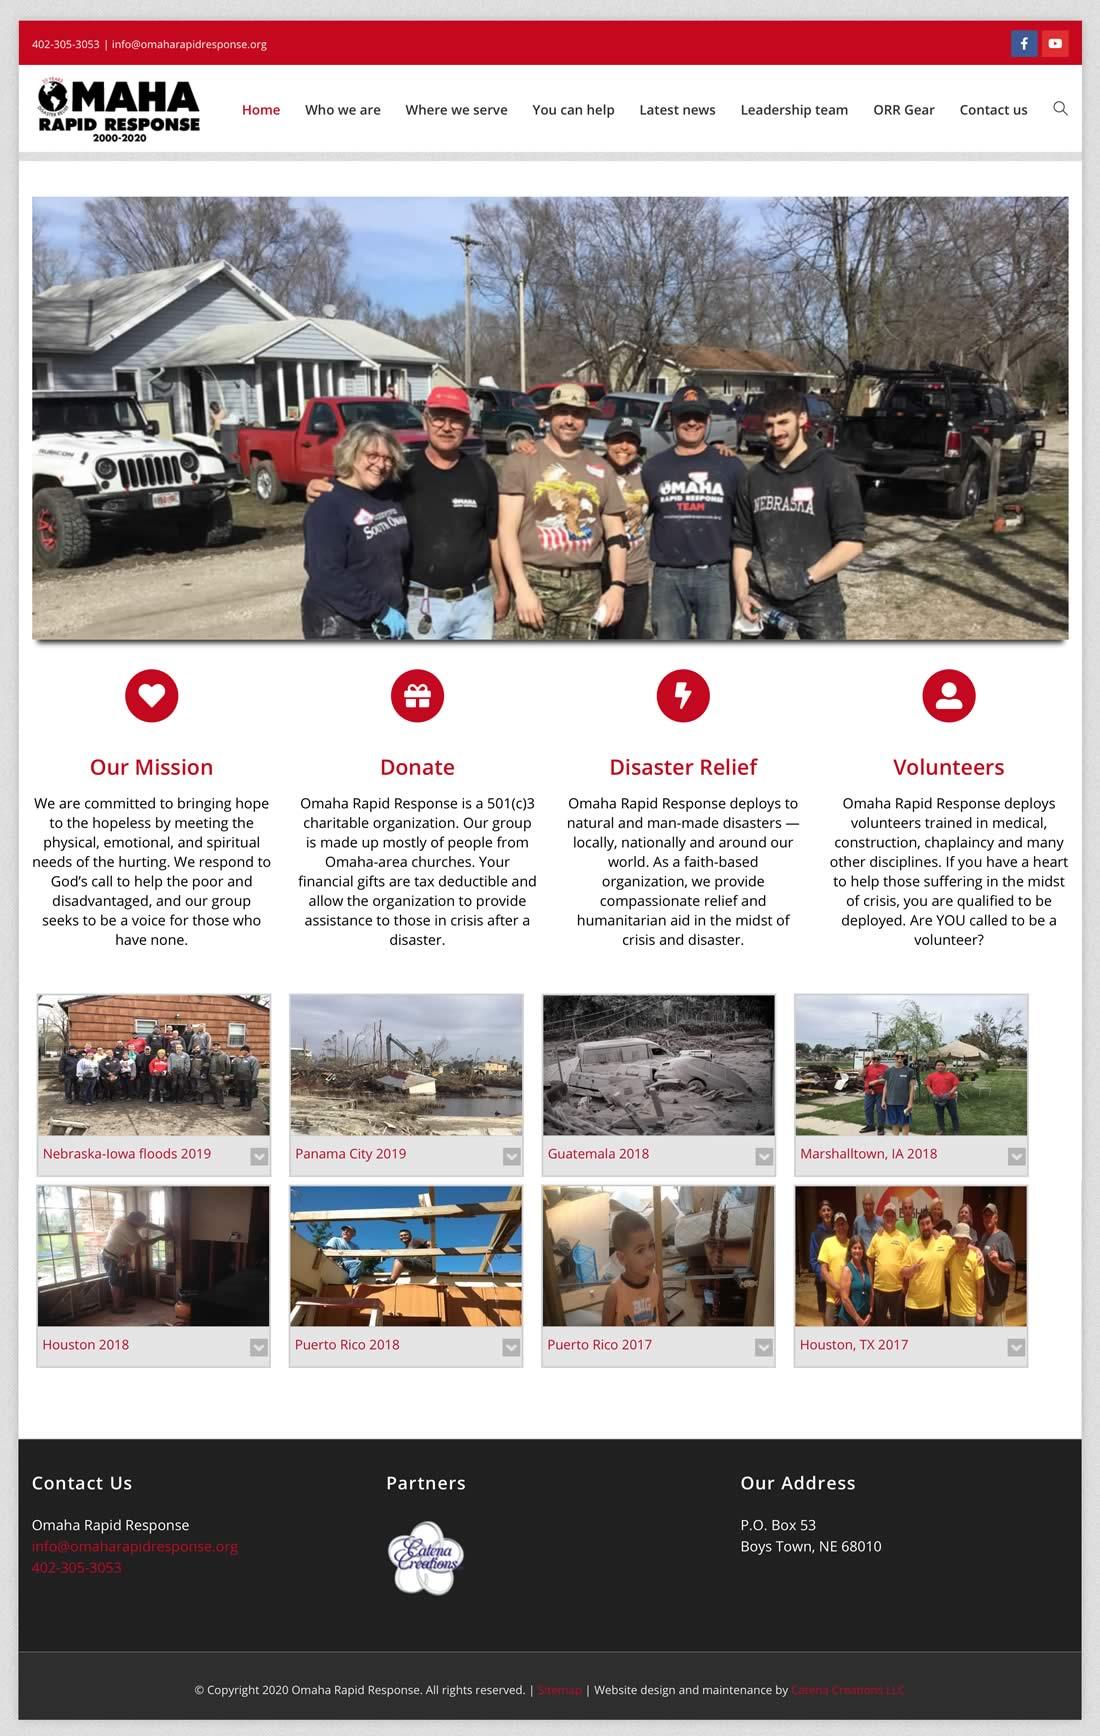 Omaha Rapid Response website redesign 2020